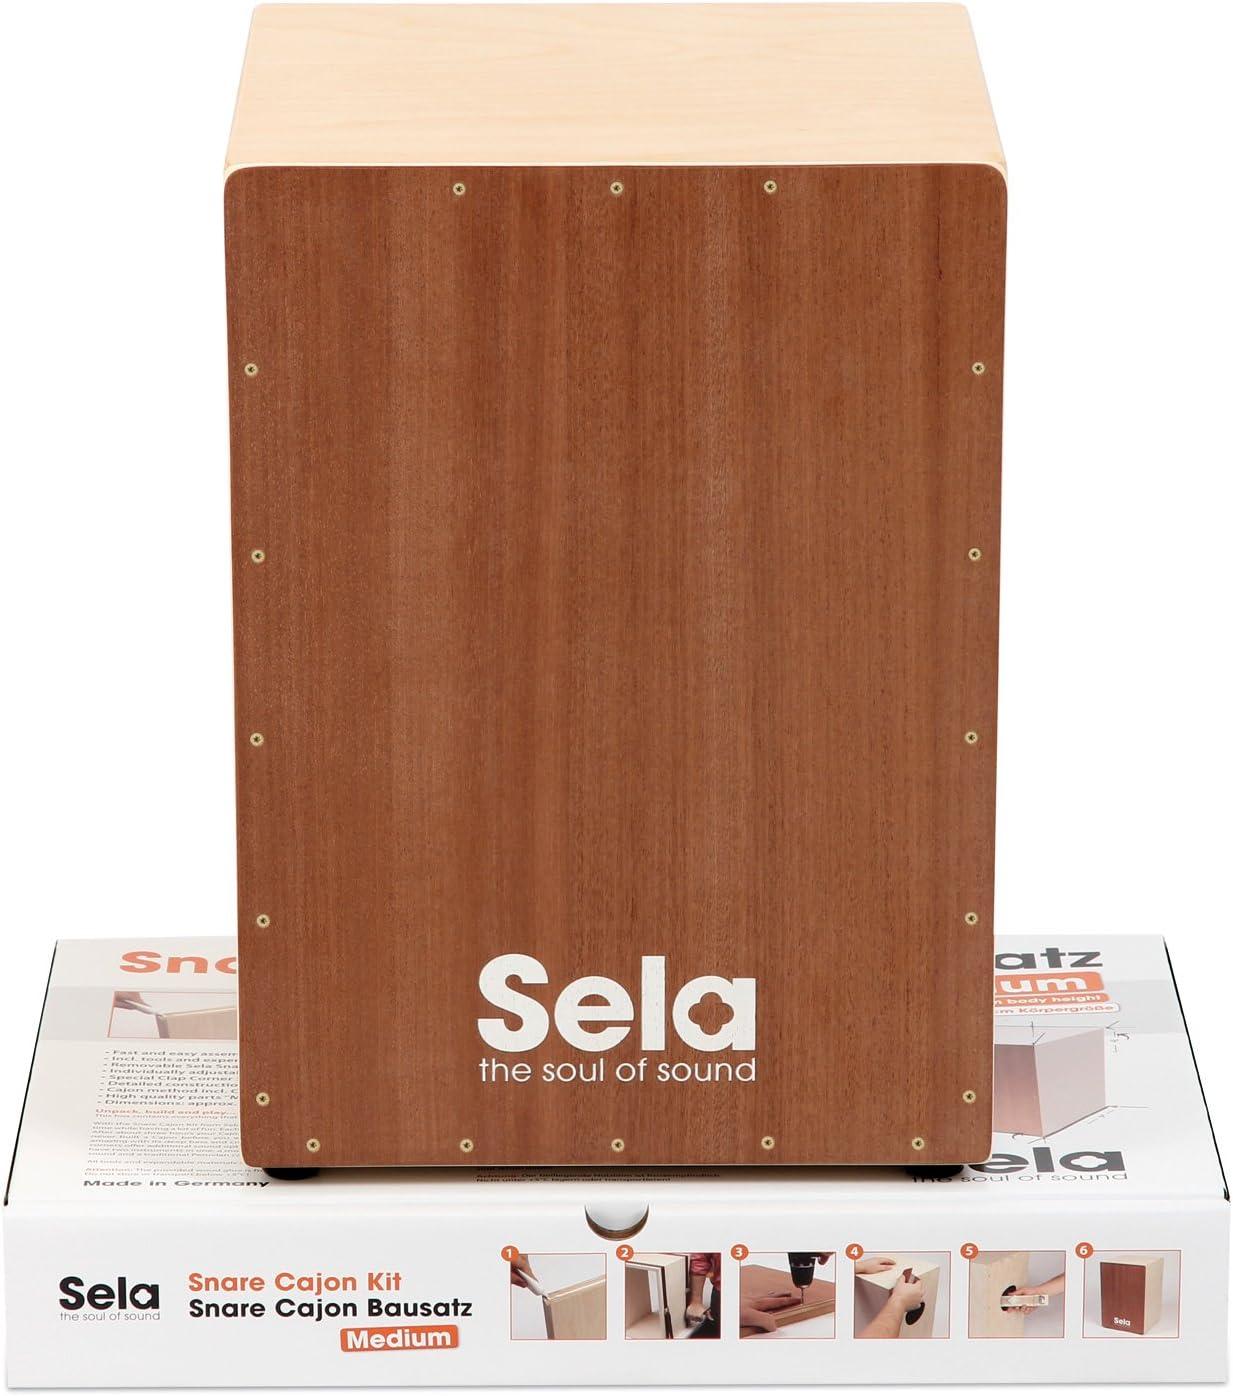 Sela Snare - Cajón, kit de montaje, mediano